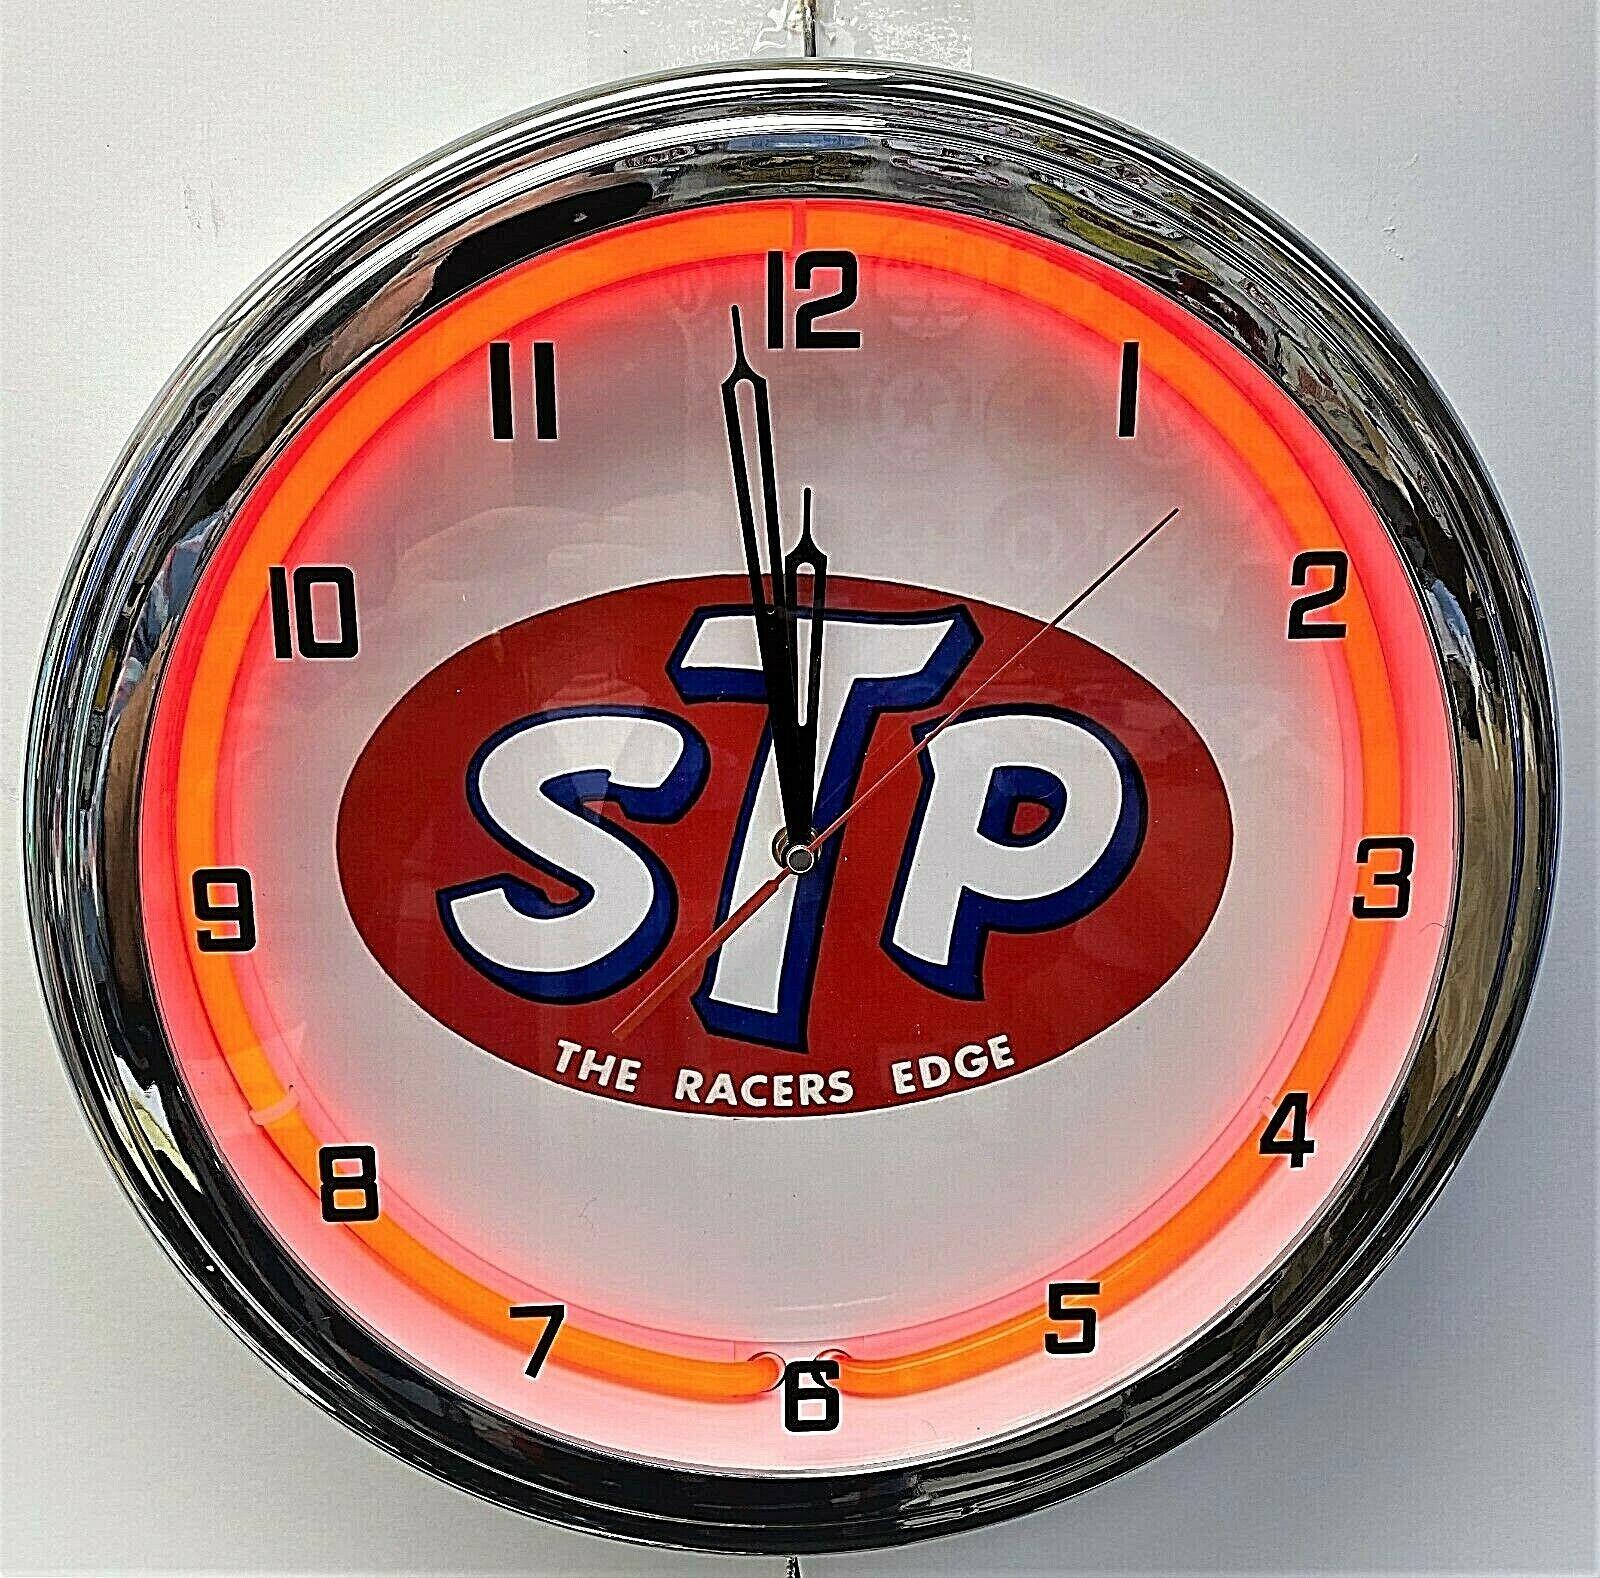 STP OIL  racers edge retro vintage garage metal decor wall sign plaque workshop